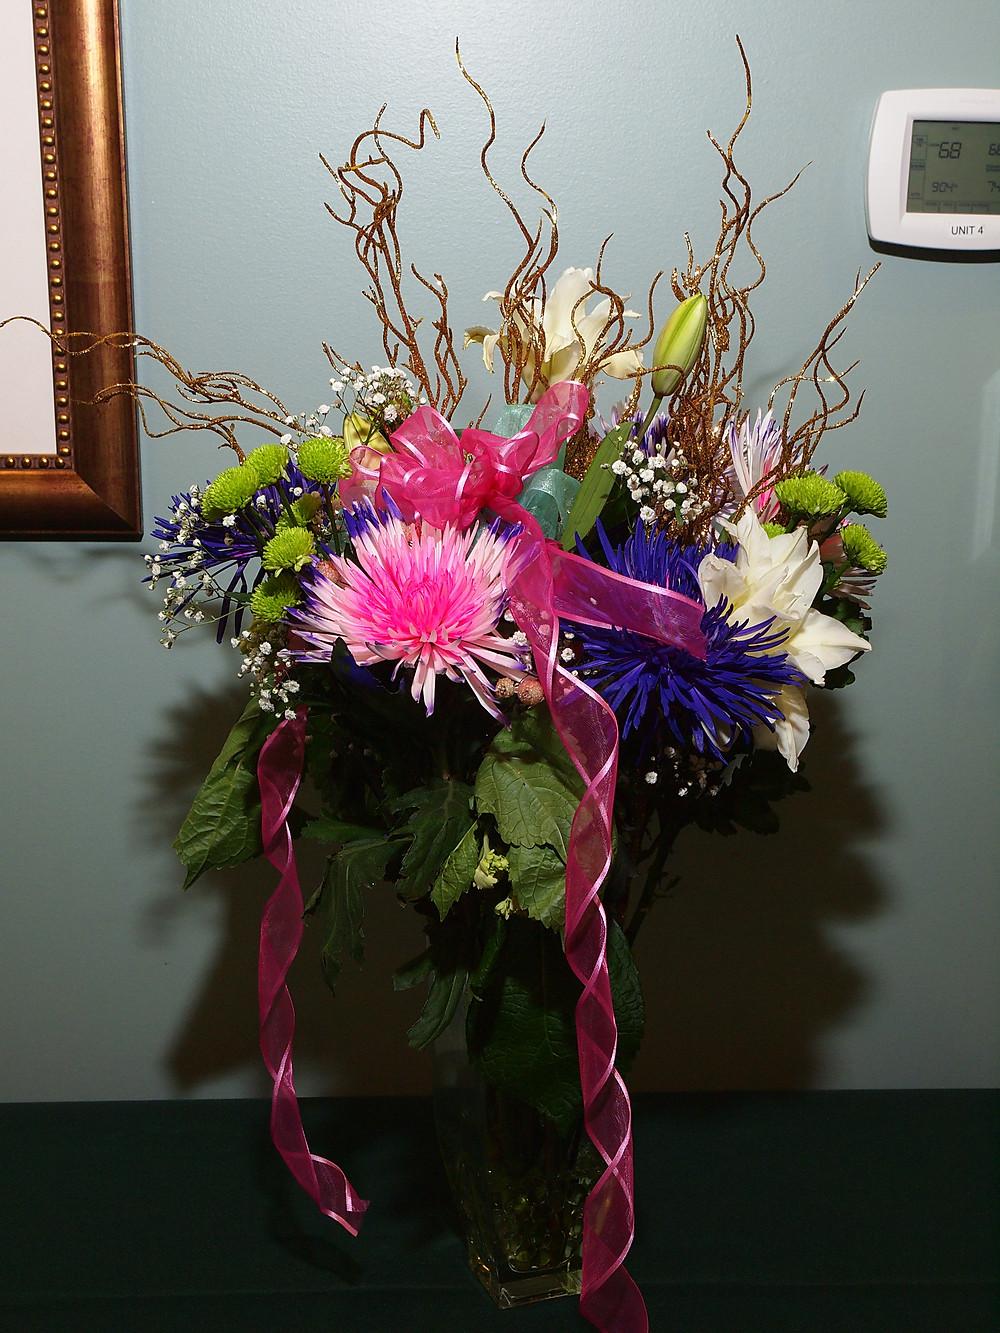 Barbara Ramsey-Chudakewich's Floral Design Exhibit